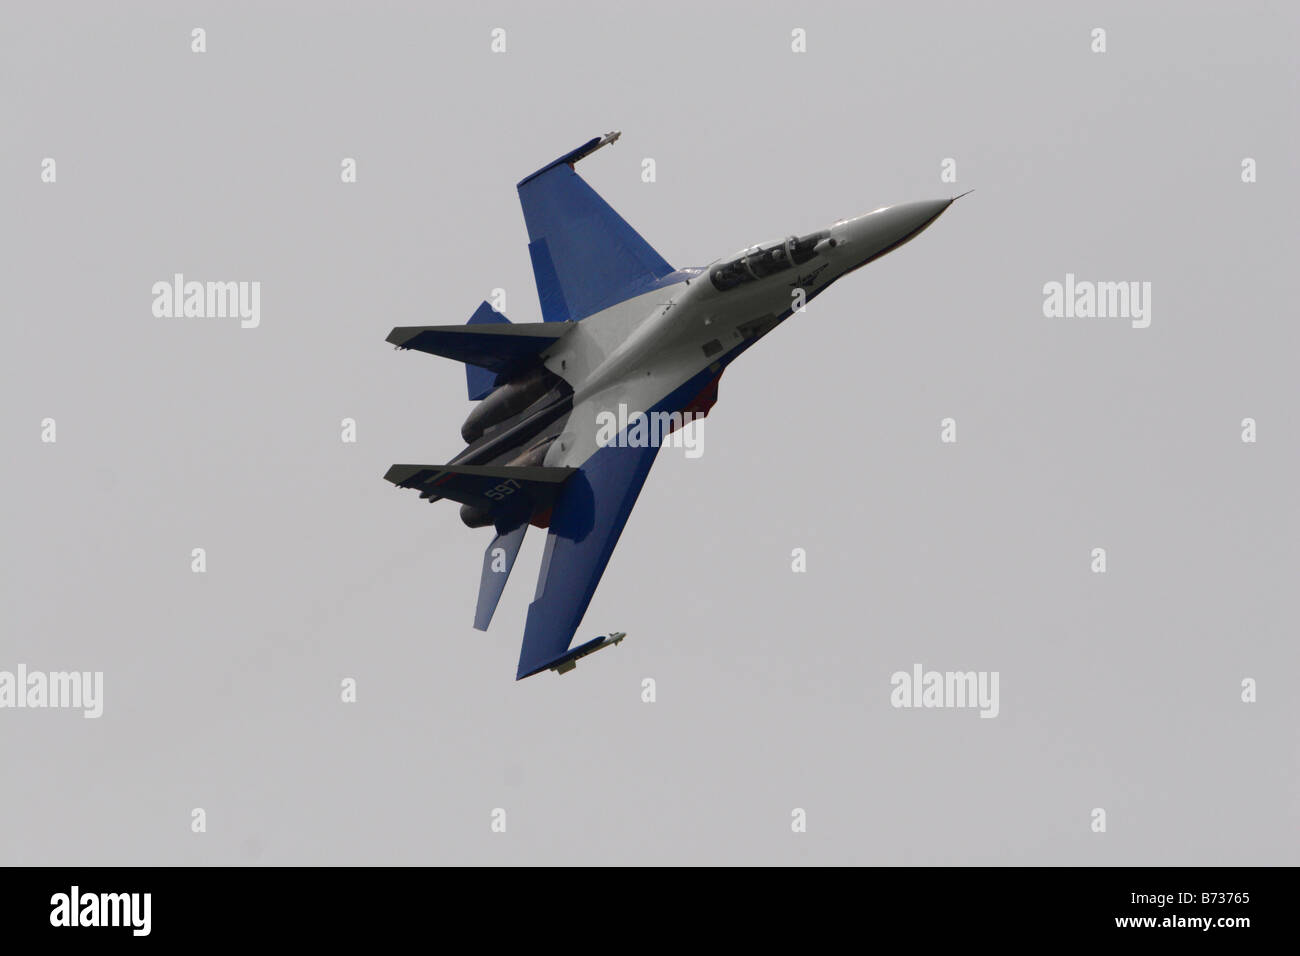 Sukhoi Su 27 SMK Flanker - Stock Image